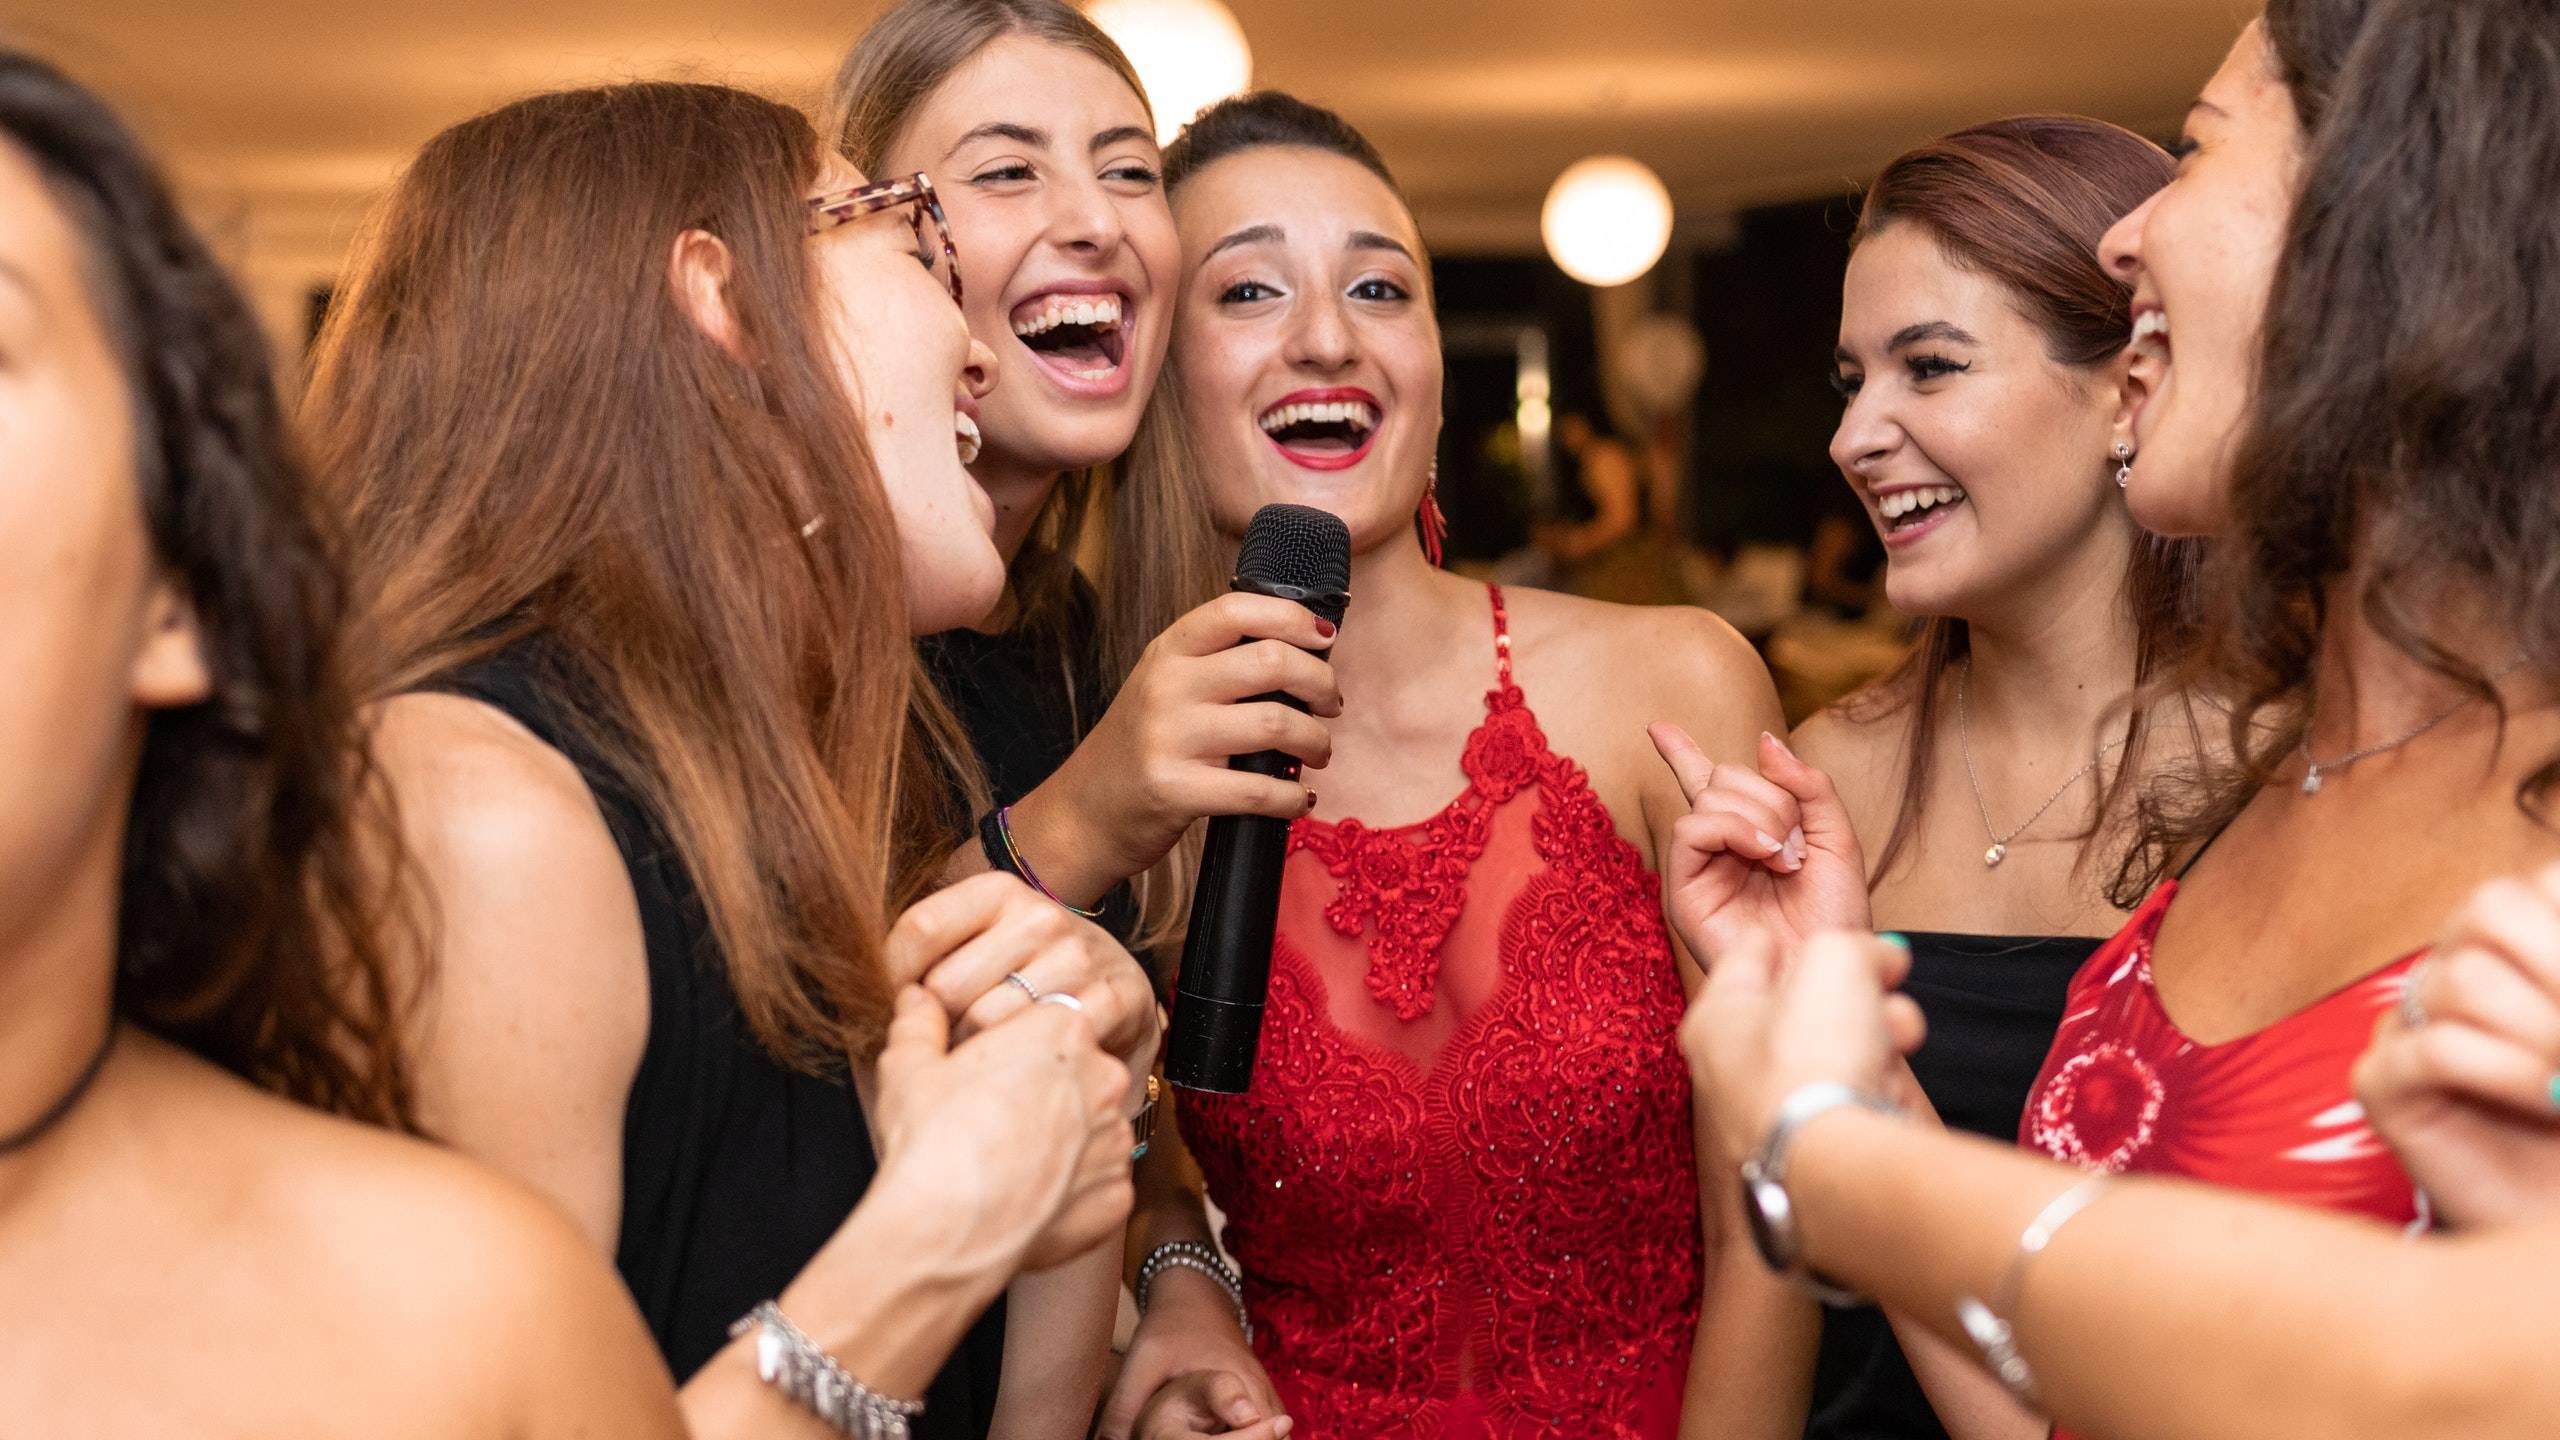 Santa-Caterina-Village-Scalea-events-party